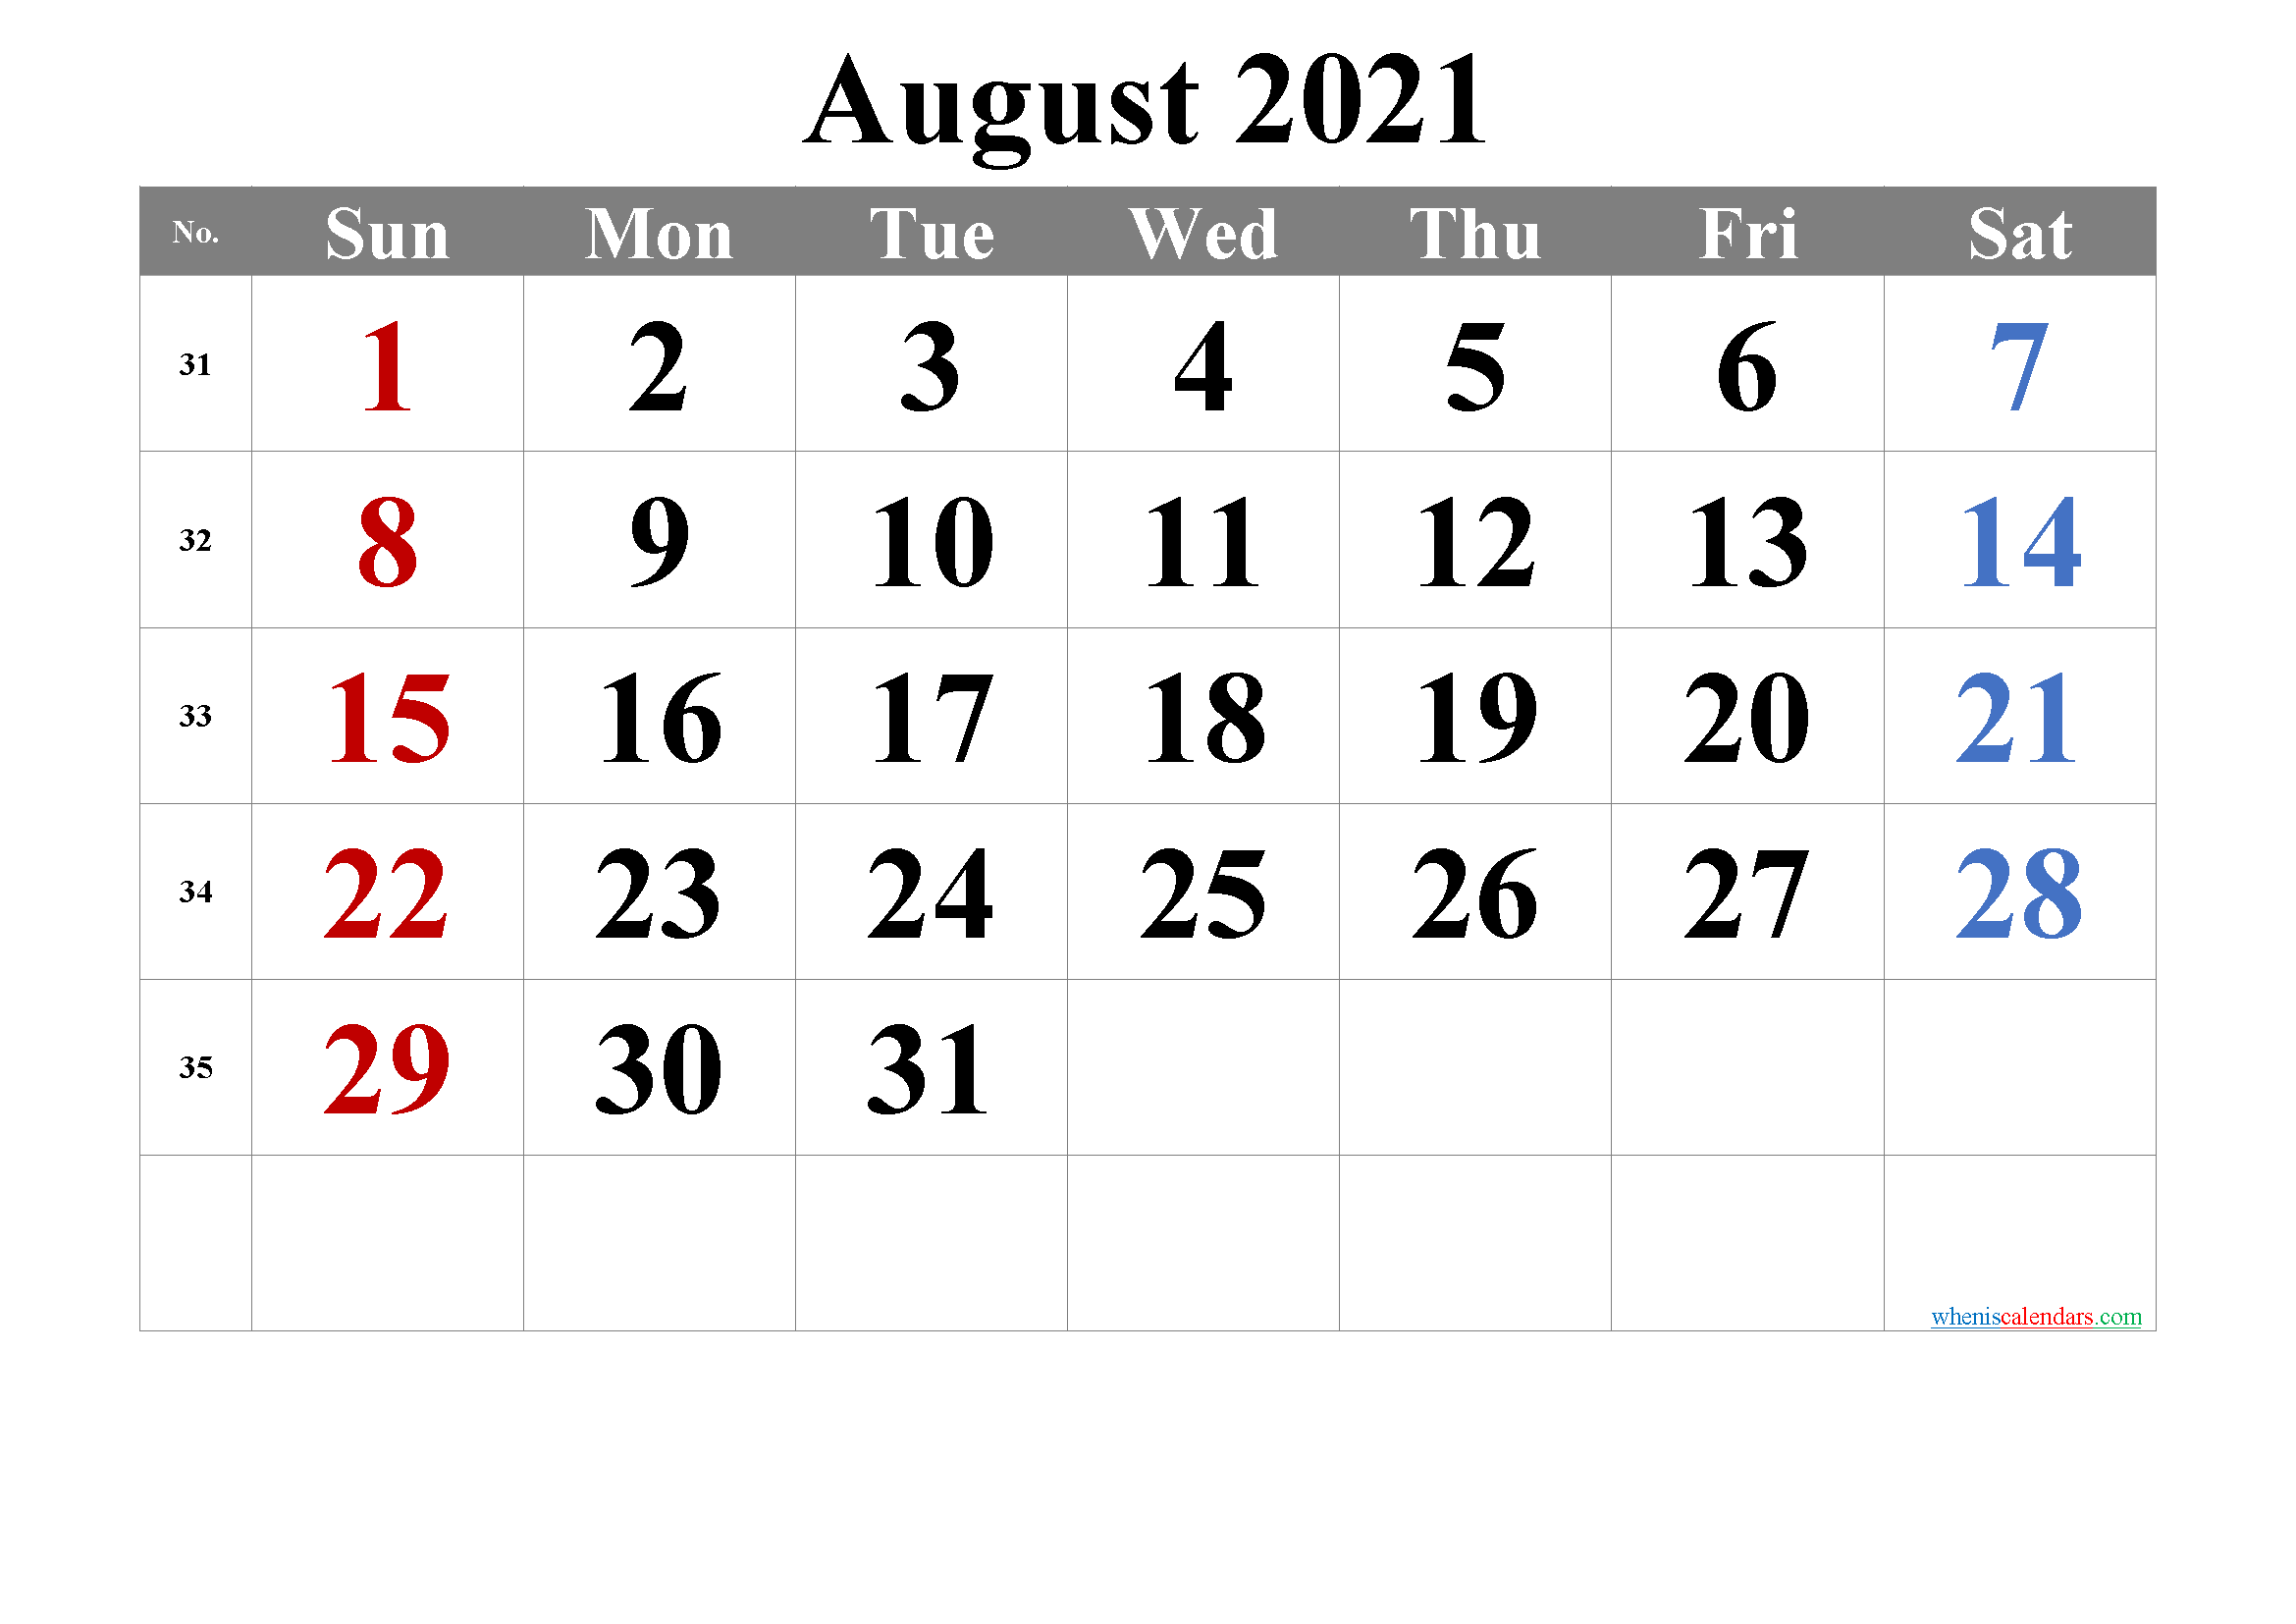 August 2021 Calendar with Holidays Printable